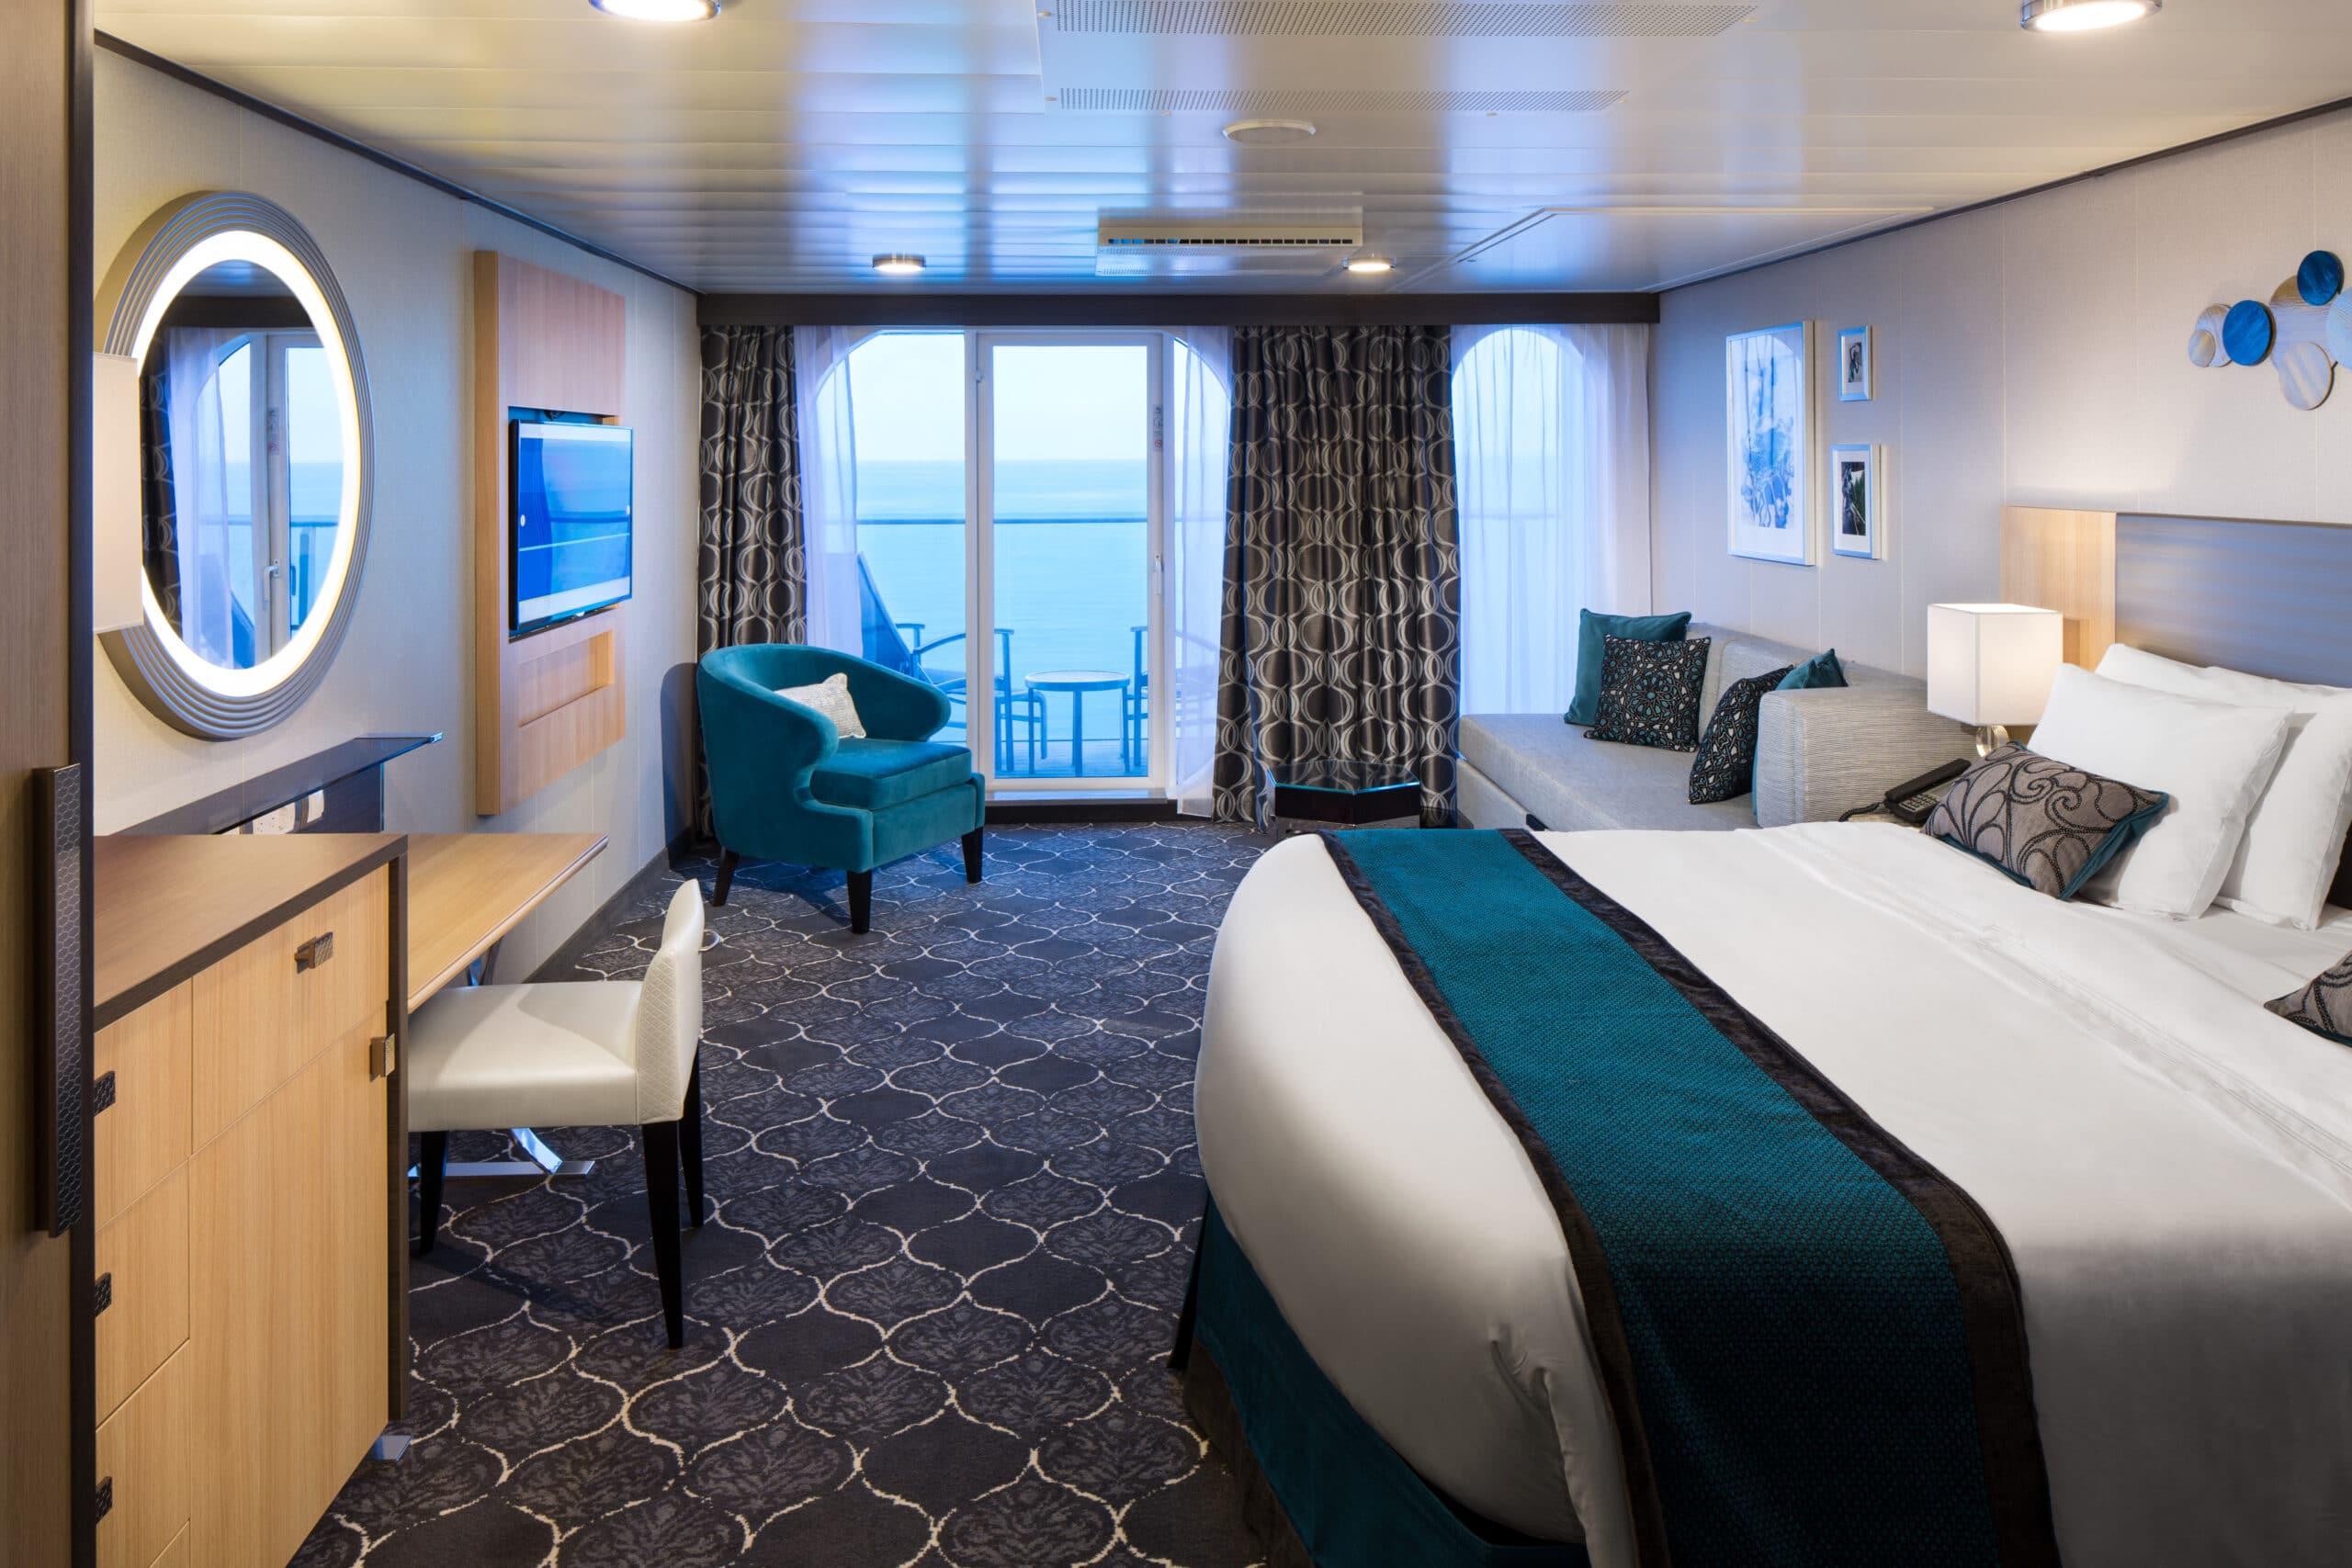 Royal-Caribbean-International-Harmony-of-the-Seas-Symphony-of-the-seas-schip-cruiseschip-categorie-J3-J4-Junior-Suite